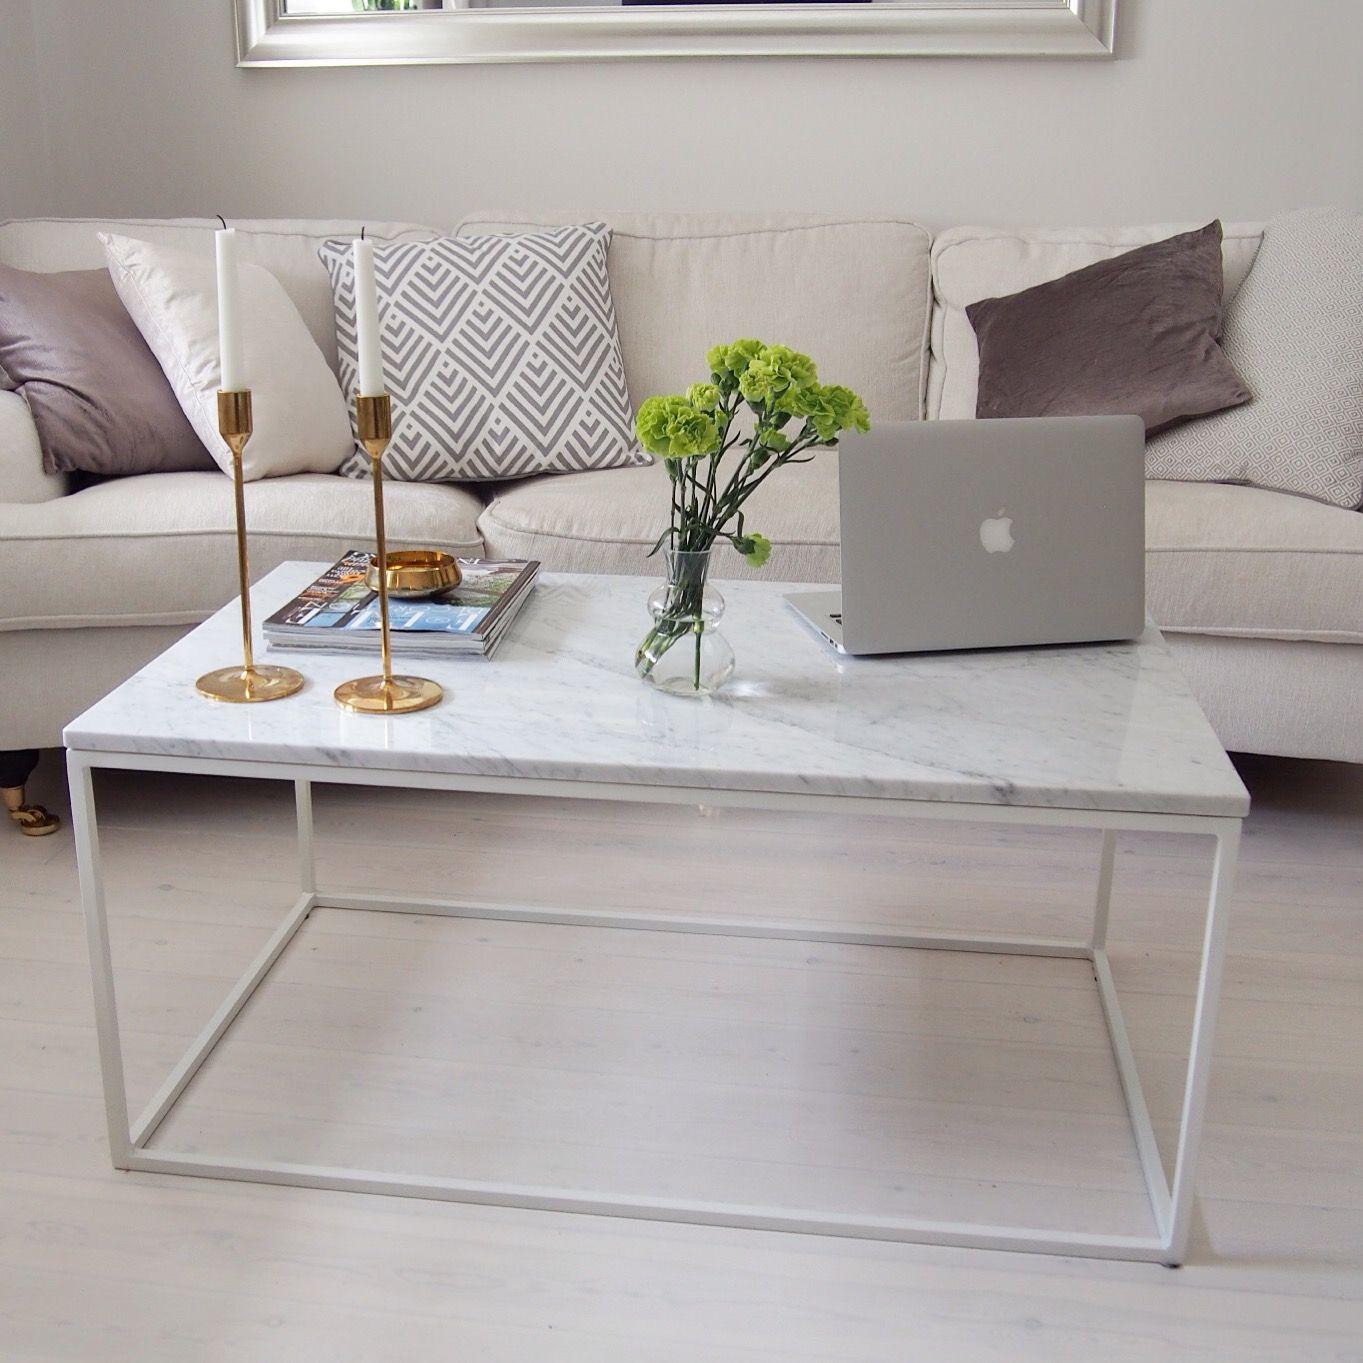 marmor marble bord soffbord white vit carrara brass m ssing hem inredning sisustus stockholm. Black Bedroom Furniture Sets. Home Design Ideas